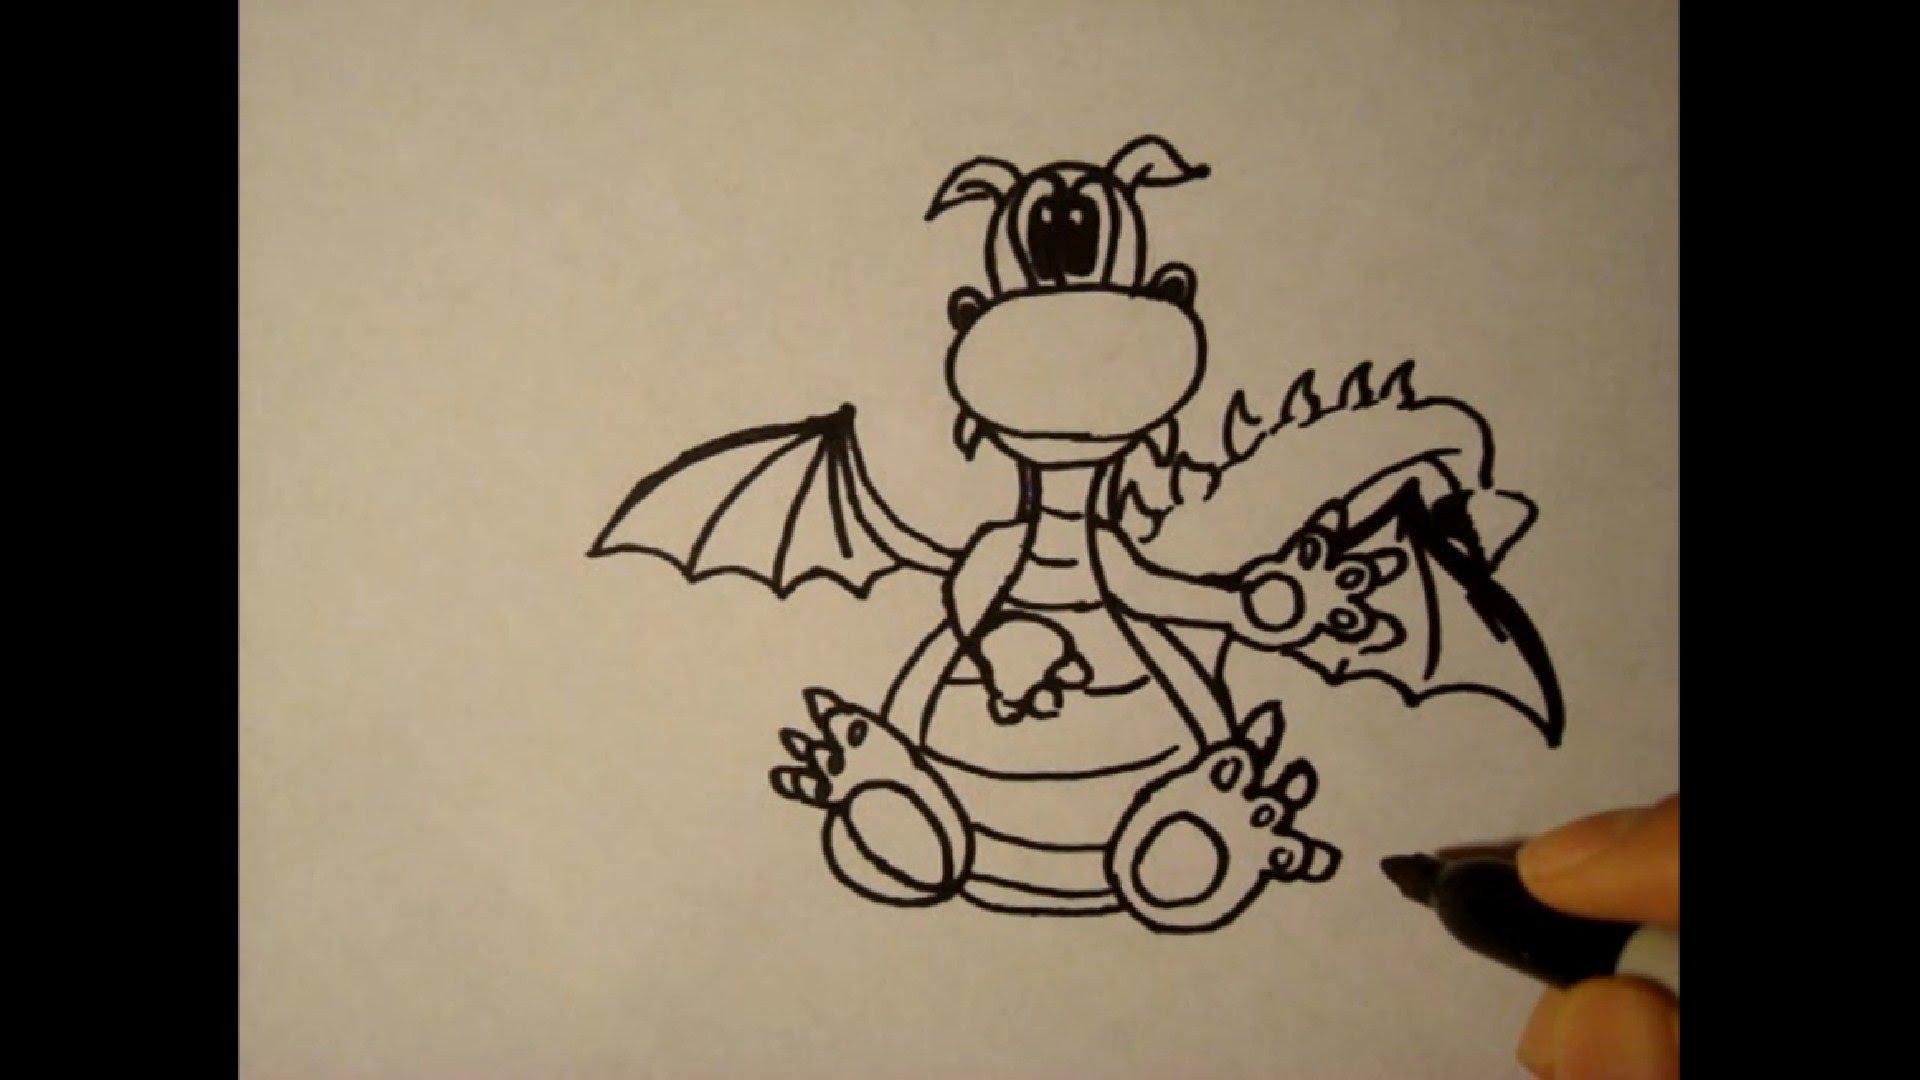 1920x1080 How To Draw A Dragonheadeasystep By Stepfor Beginnerscomo